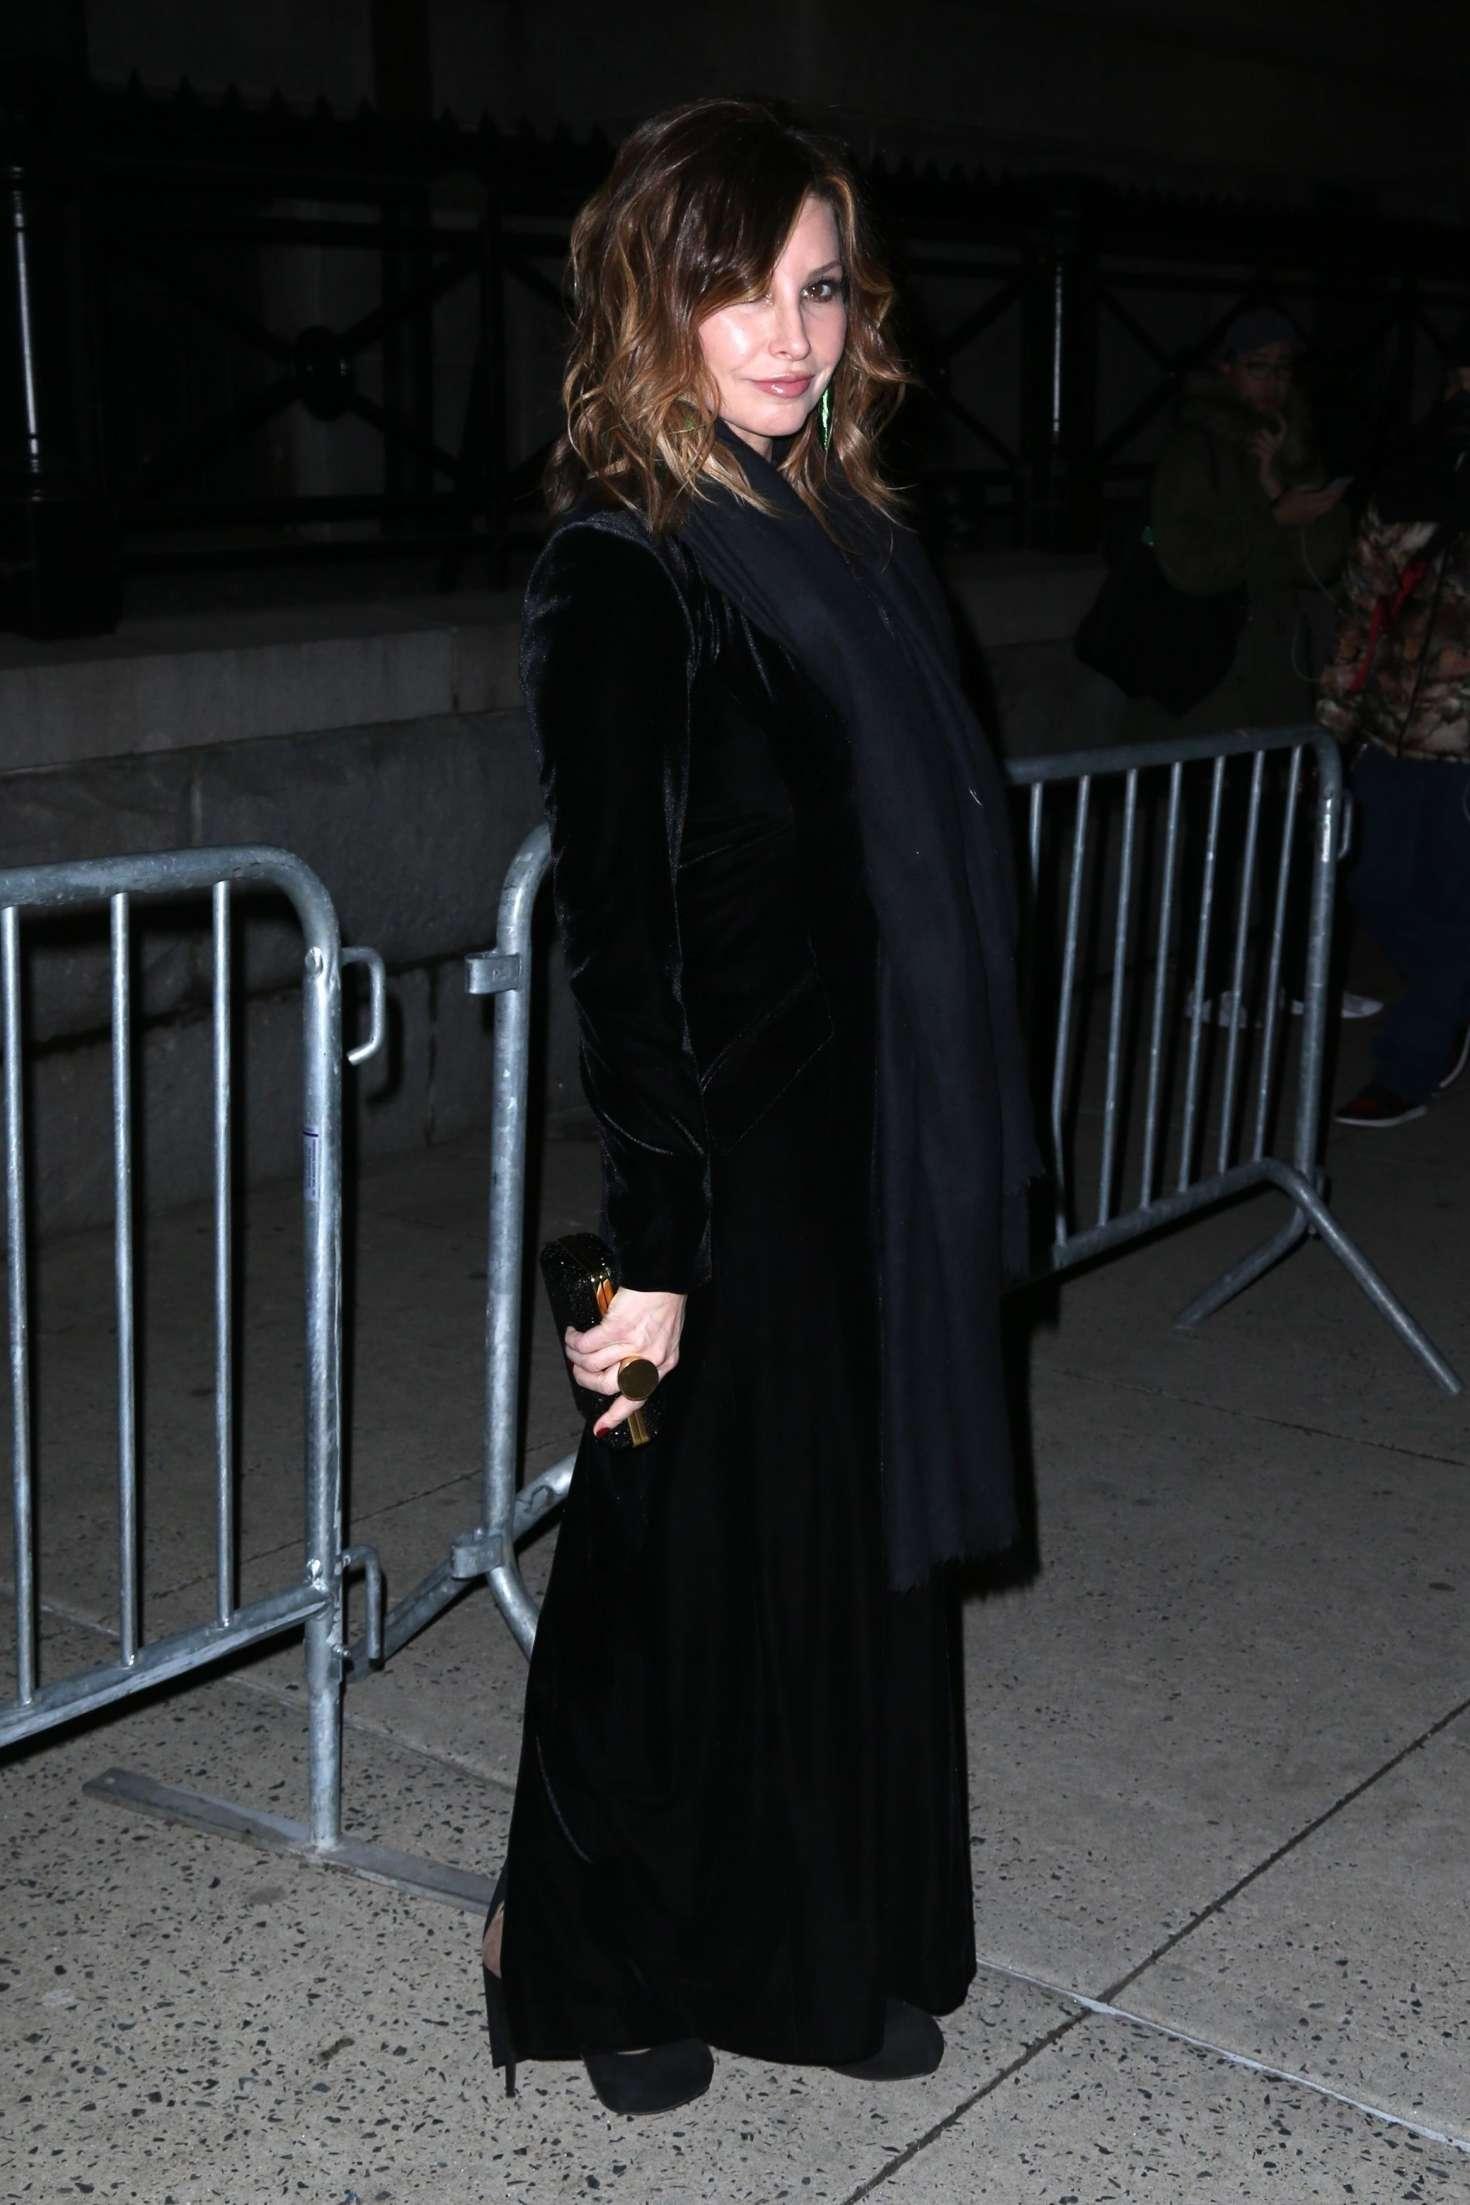 Gina Gershon 2018 : Gina Gershon: Arrives at Tom Ford Fashion Show -02